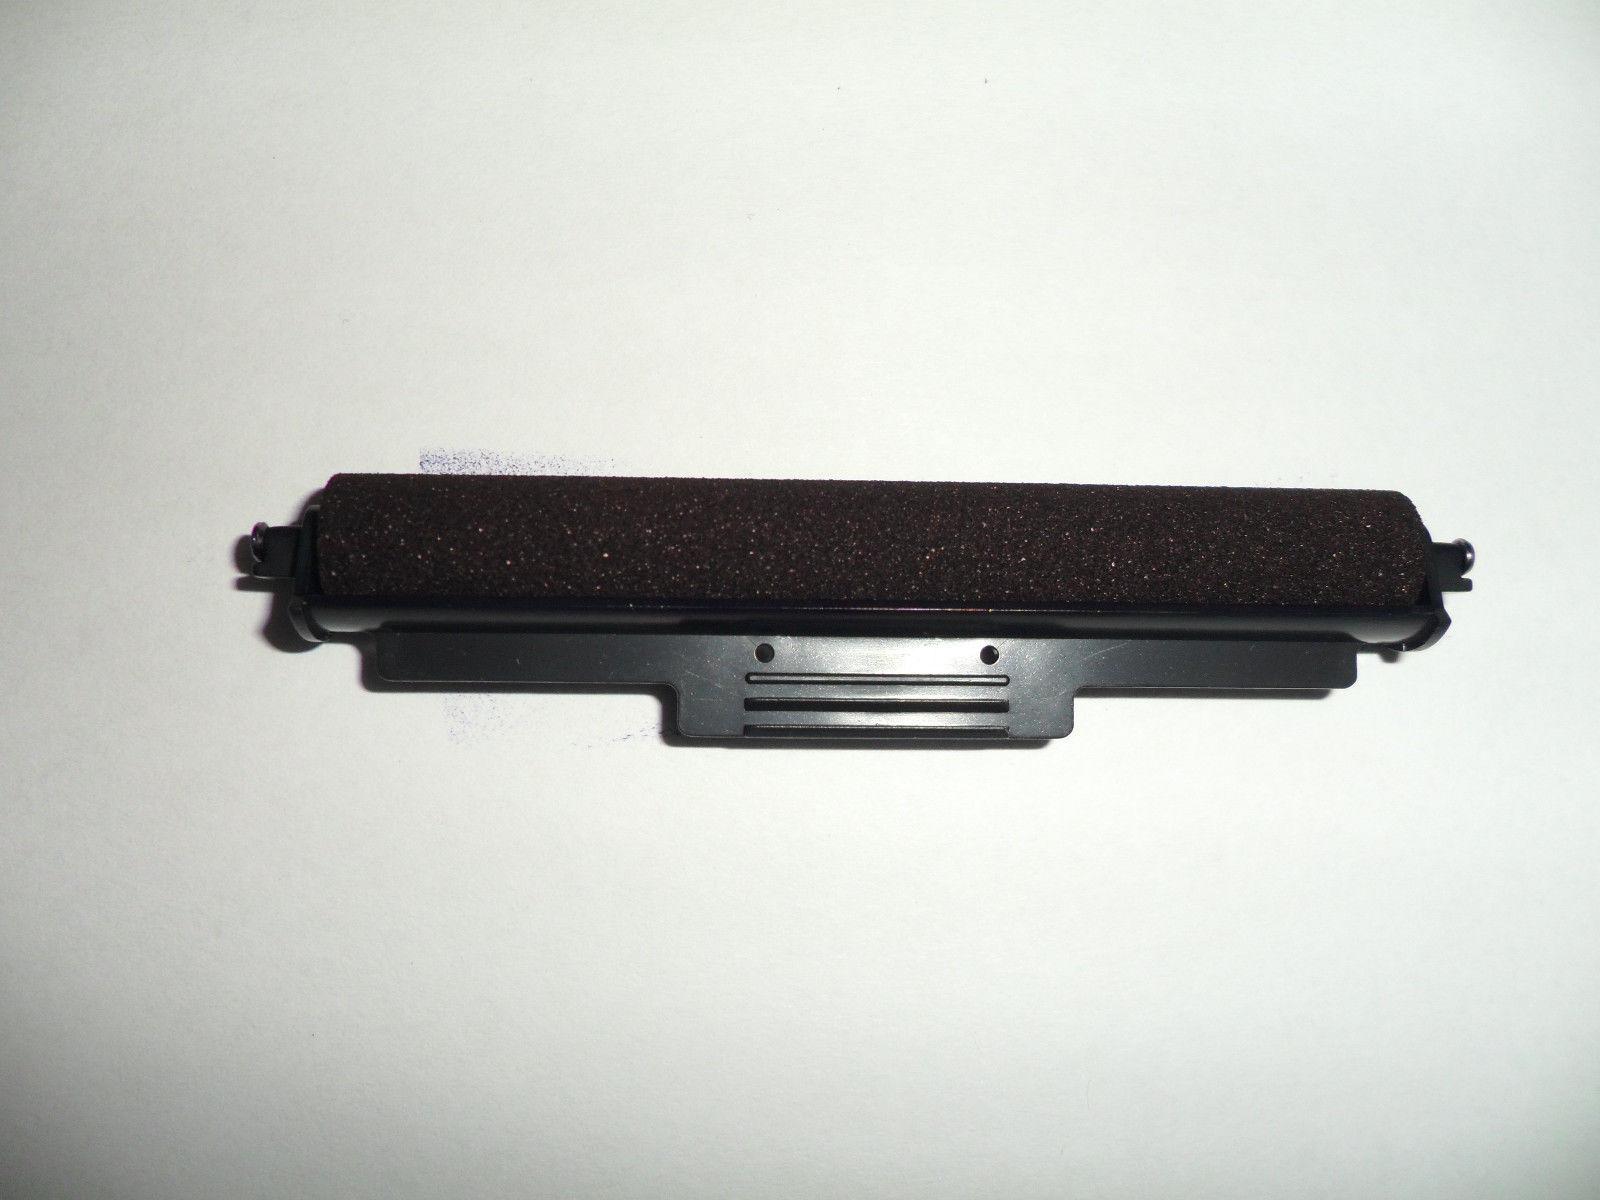 TEC MA305/MA305R/MA315 Cash Register Ink Roller (2 Pack) IR93 NR104